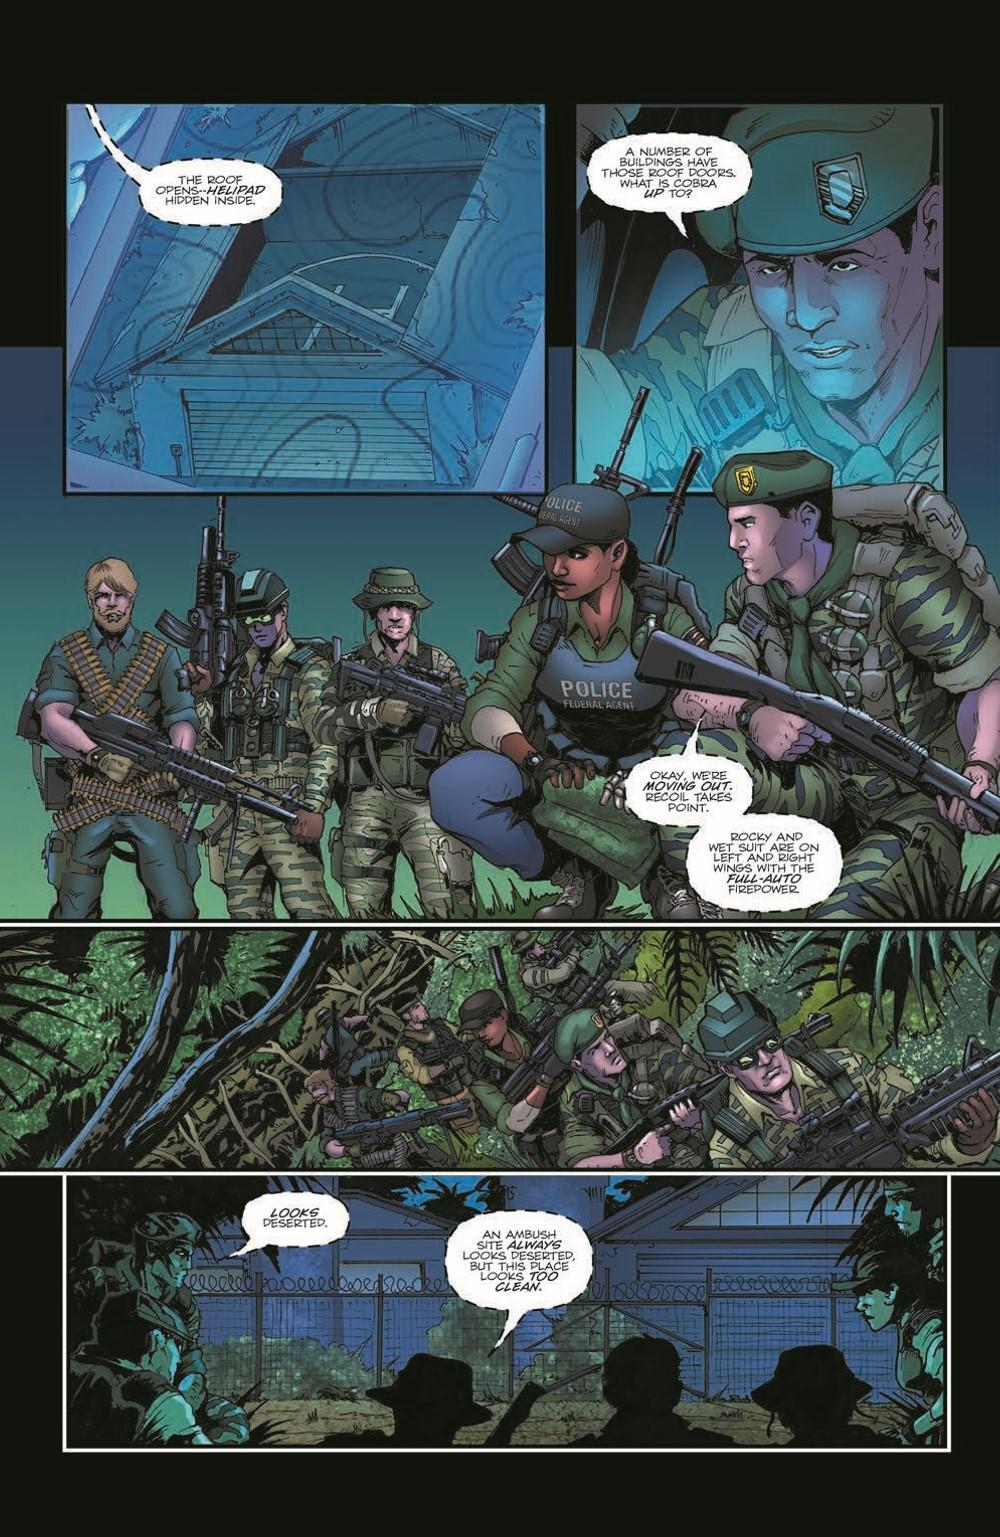 GIJoeRAH285-pr-5 ComicList Previews: G.I. JOE A REAL AMERICAN HERO #285